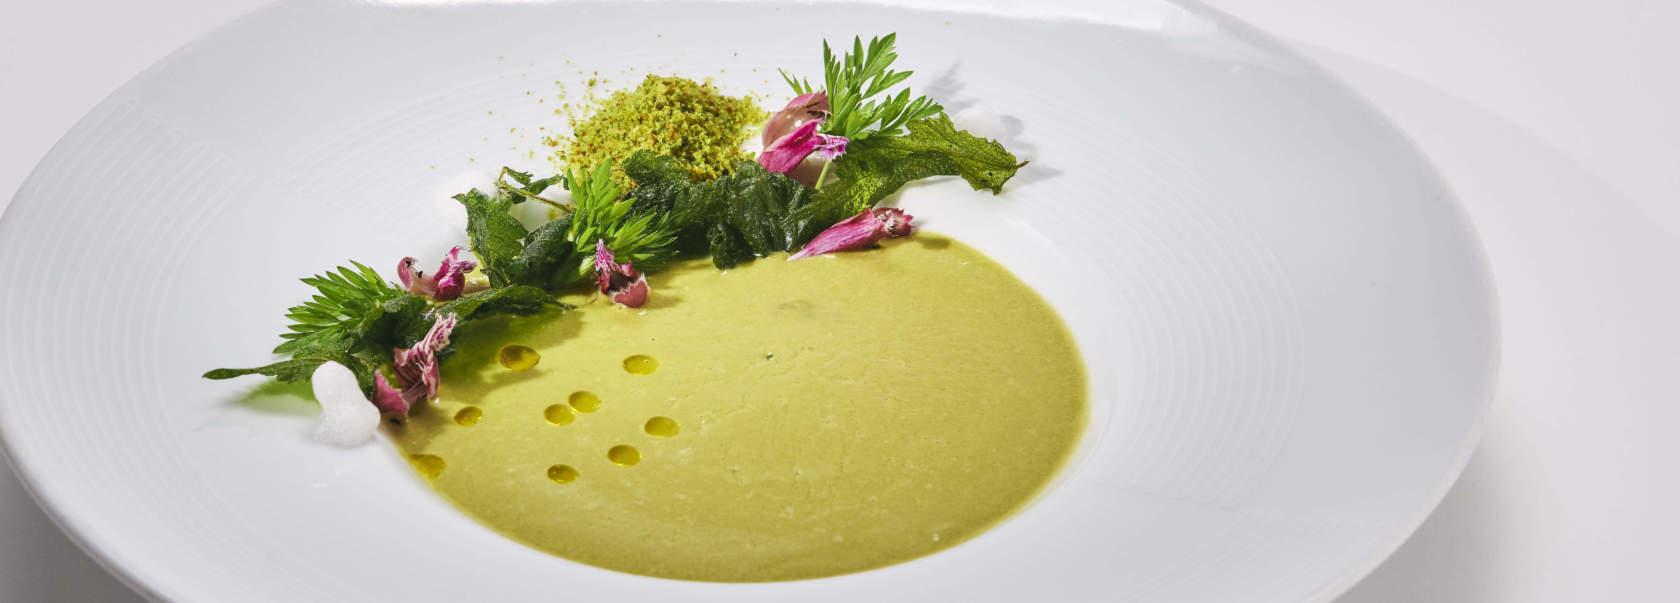 Image of a soup